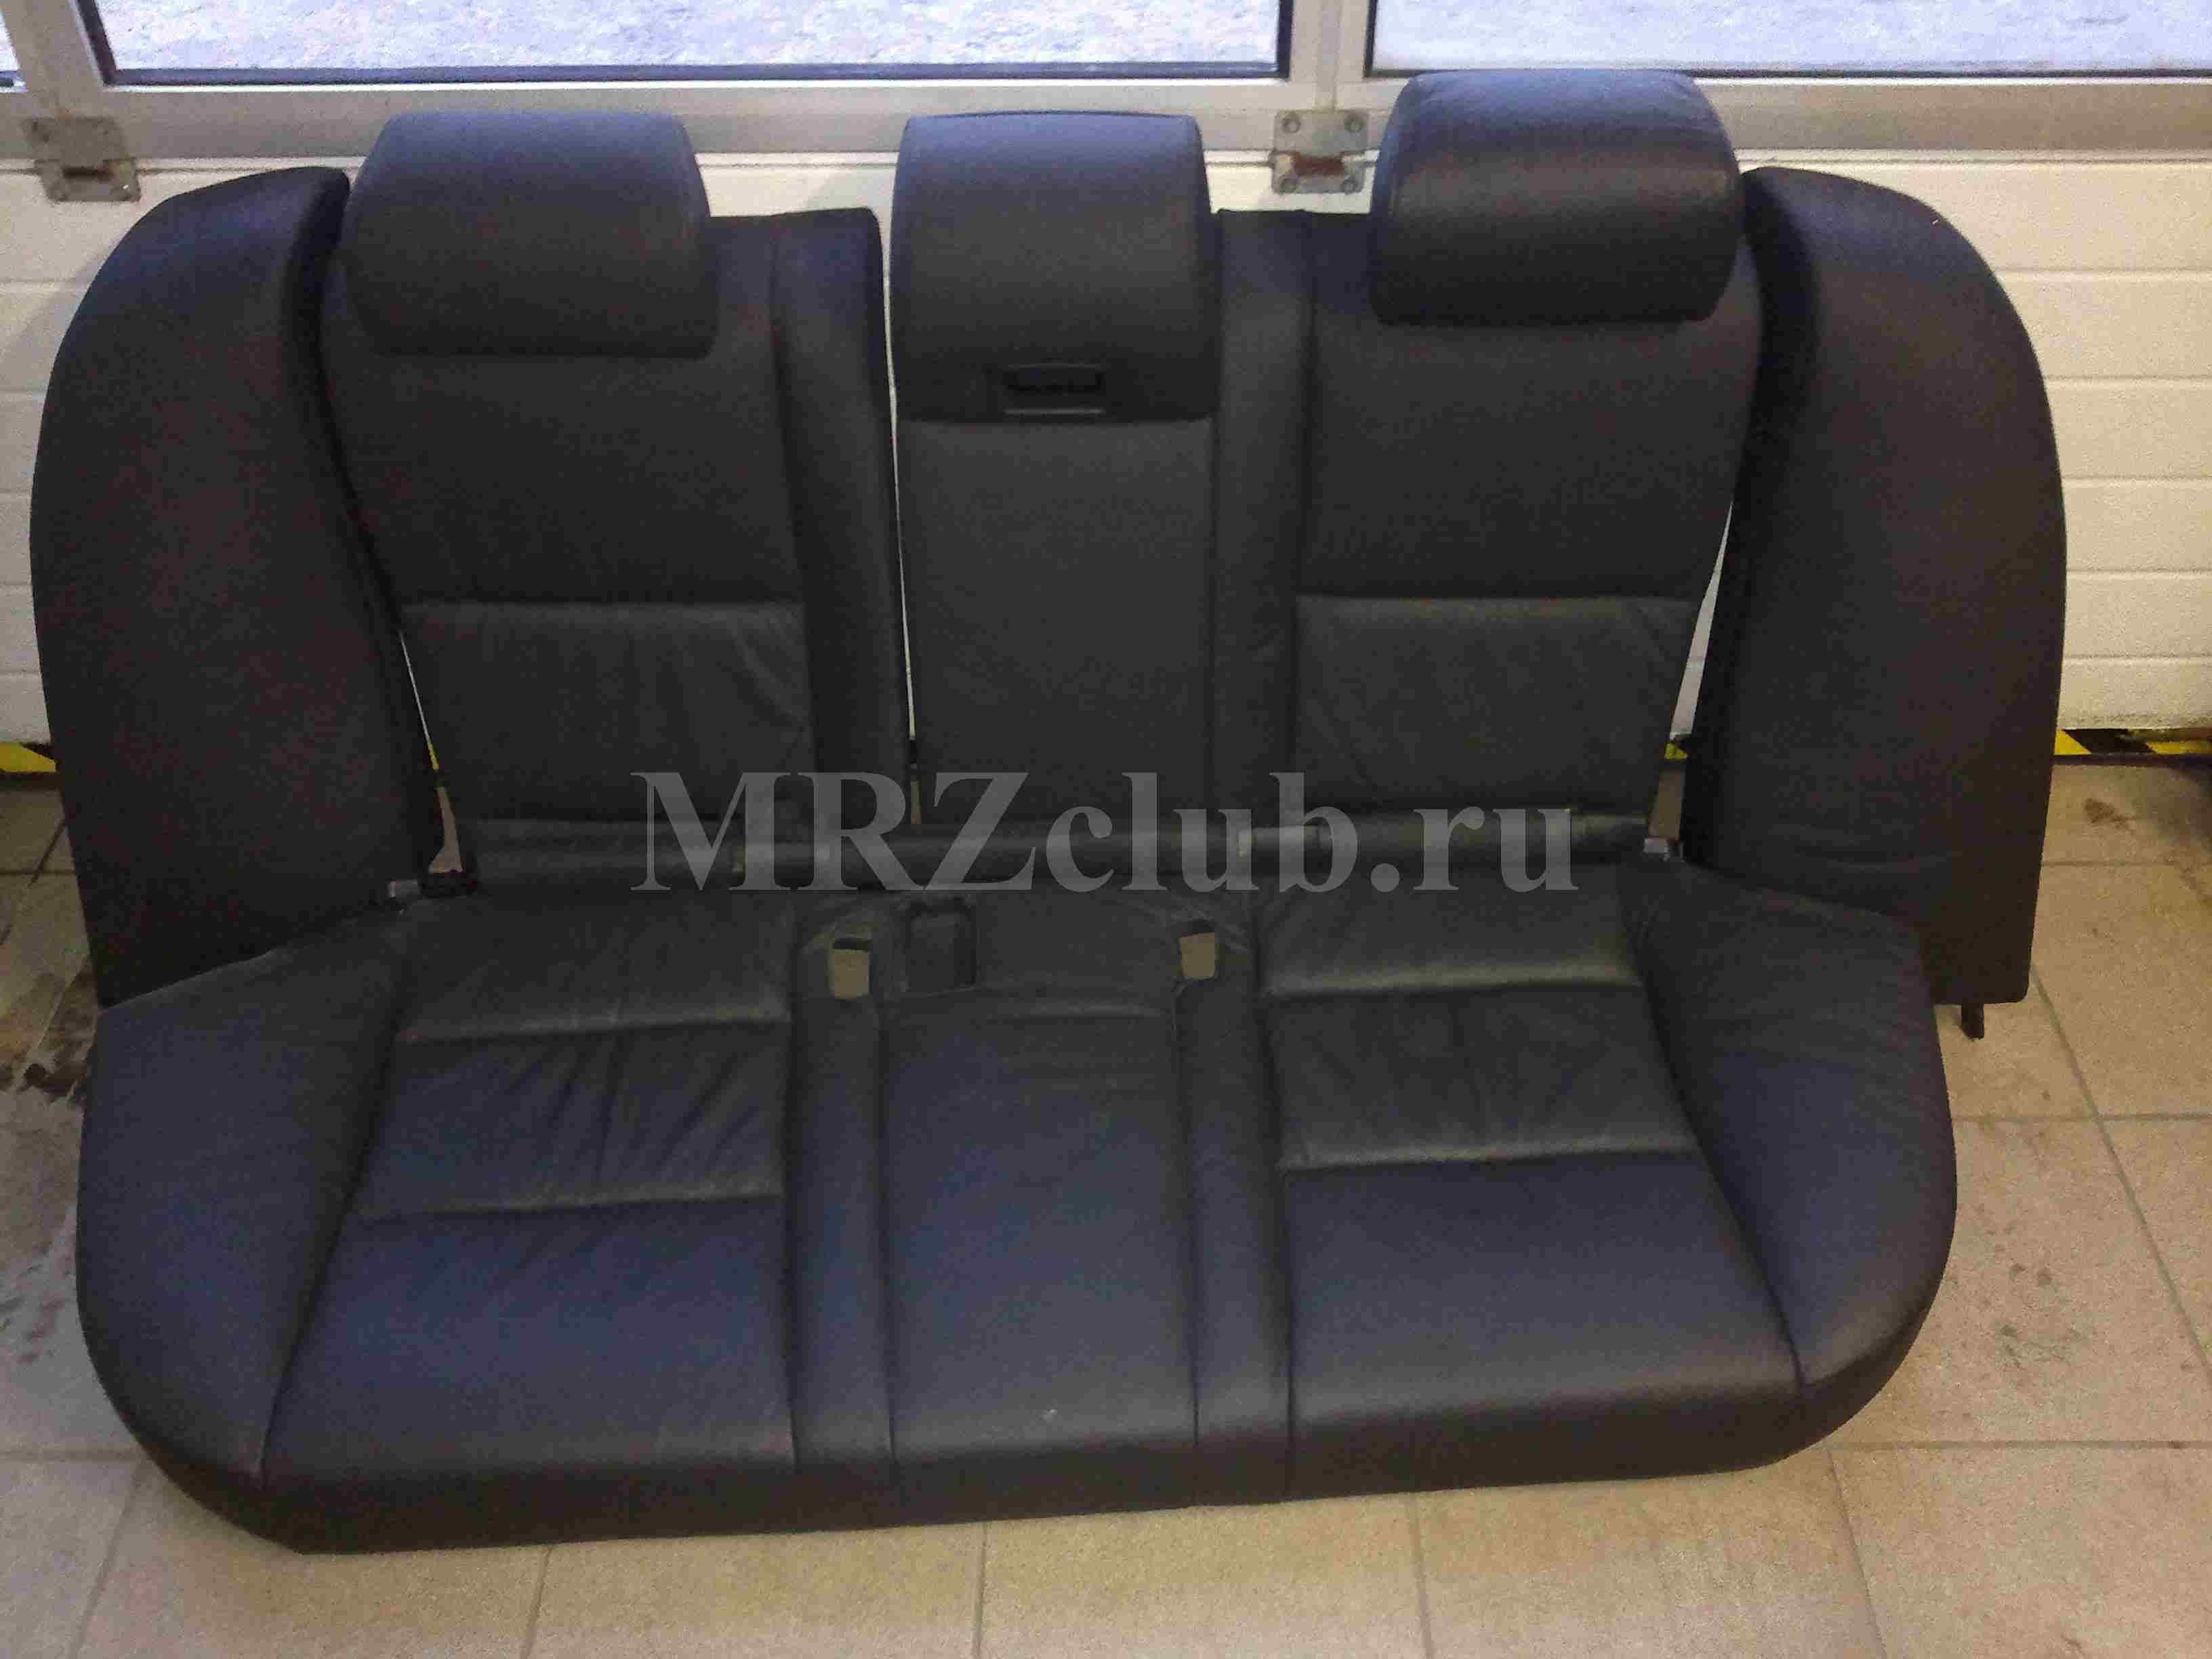 car seat office chair conversion kit earl jess design Салоны разборка БМВ bmw mrzclub